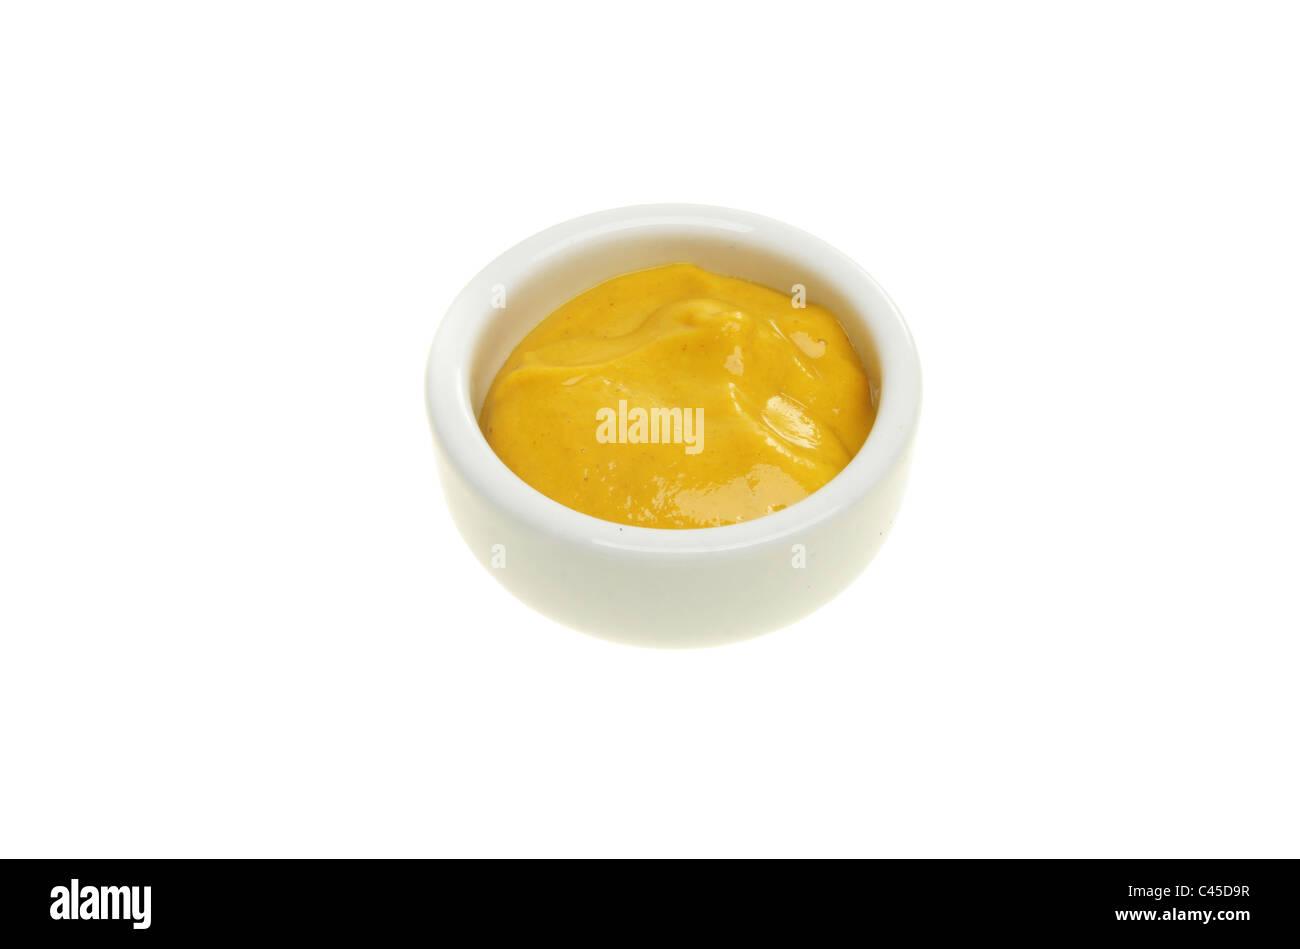 English Mustard Stock Photos & English Mustard Stock Images - Alamy